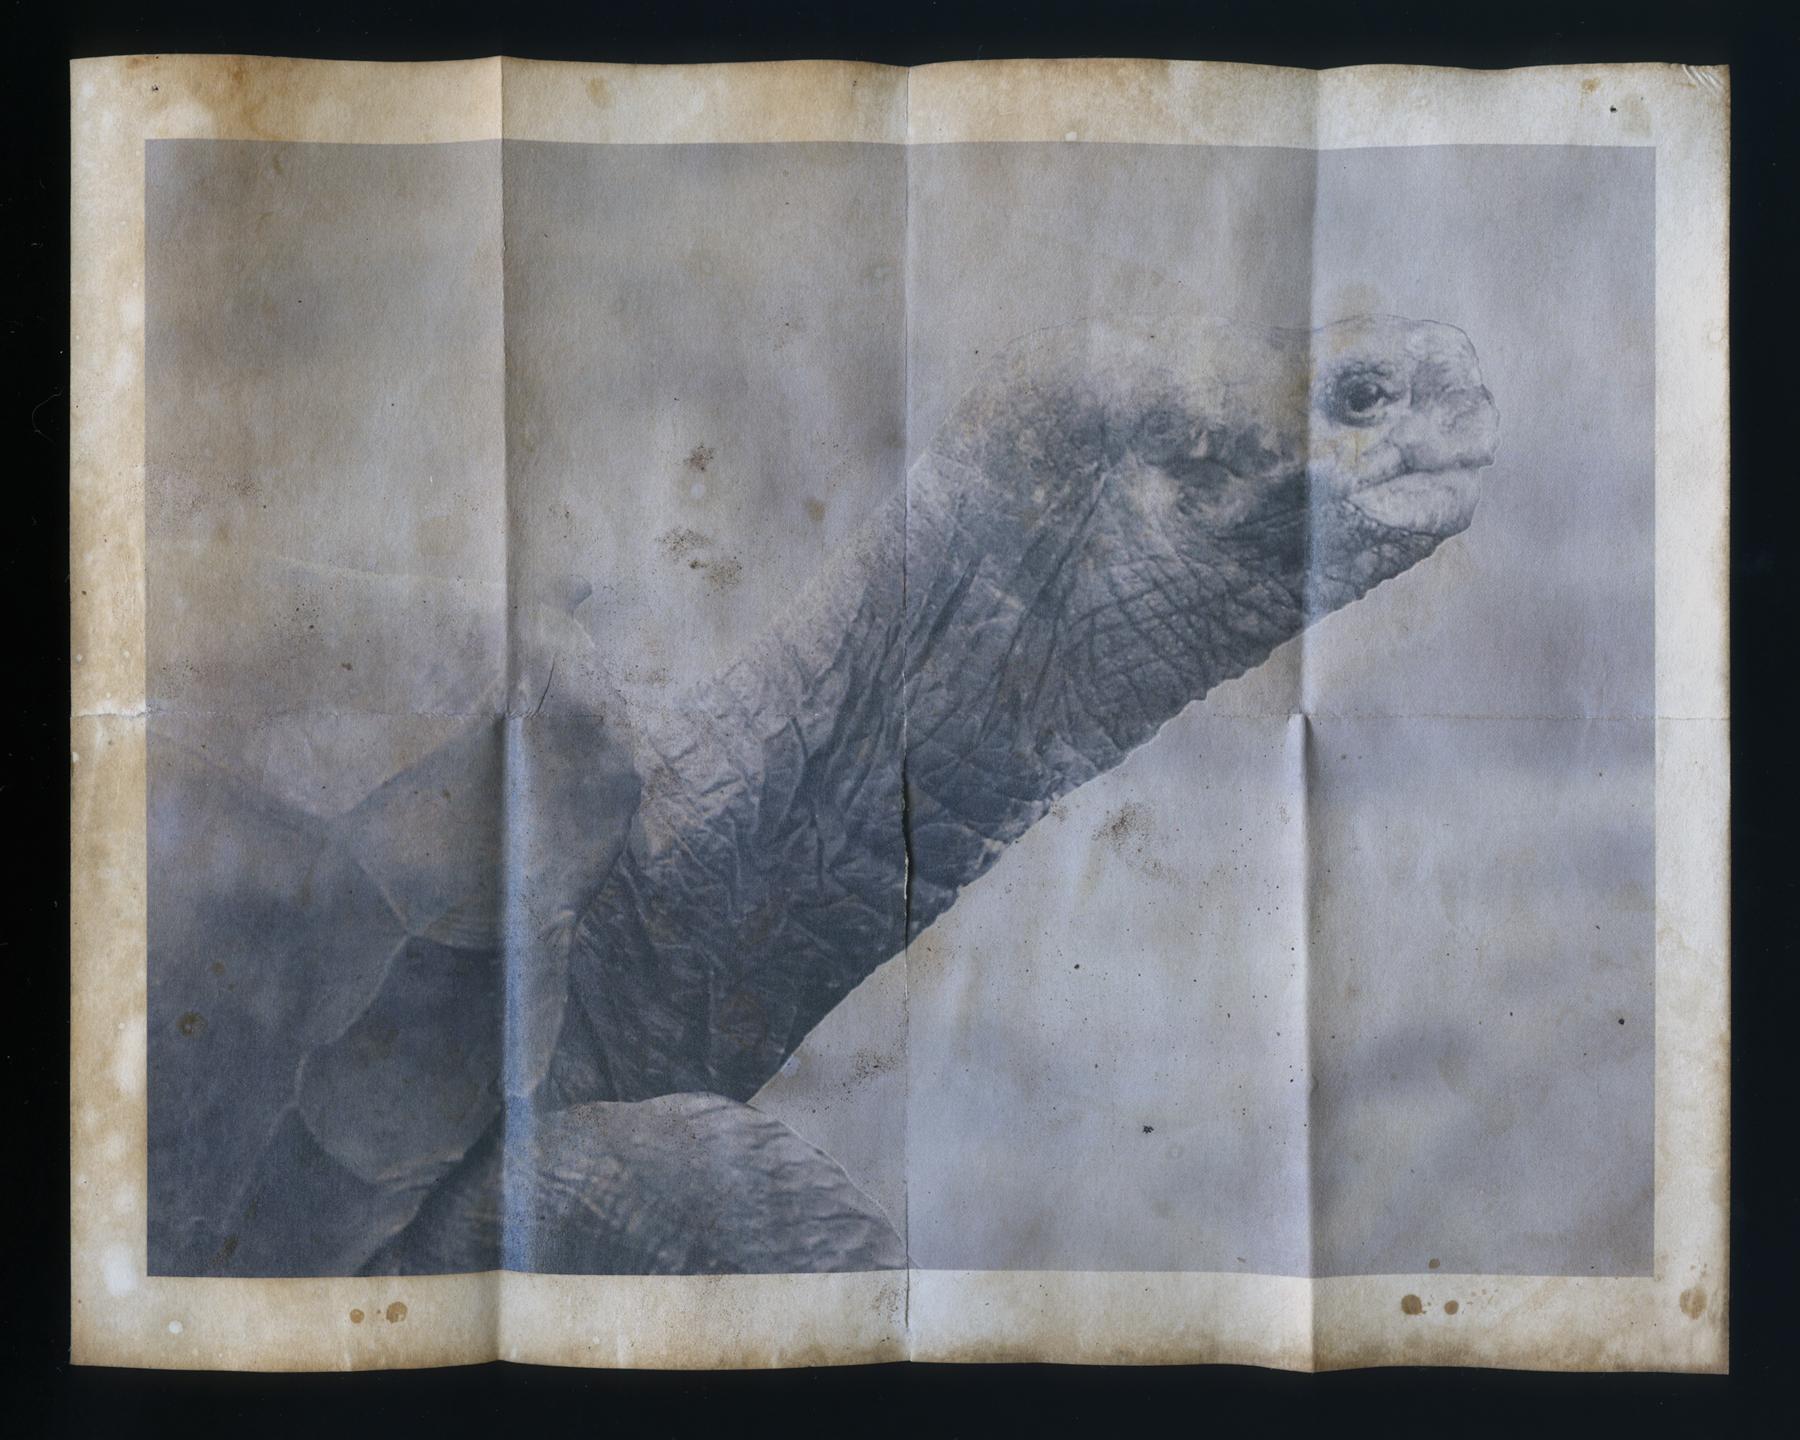 "Chelonoidis nigra abingdonii  ( memento mori )  Archival inkjet print on bamboo paper 8"" x 10 inches 2013"